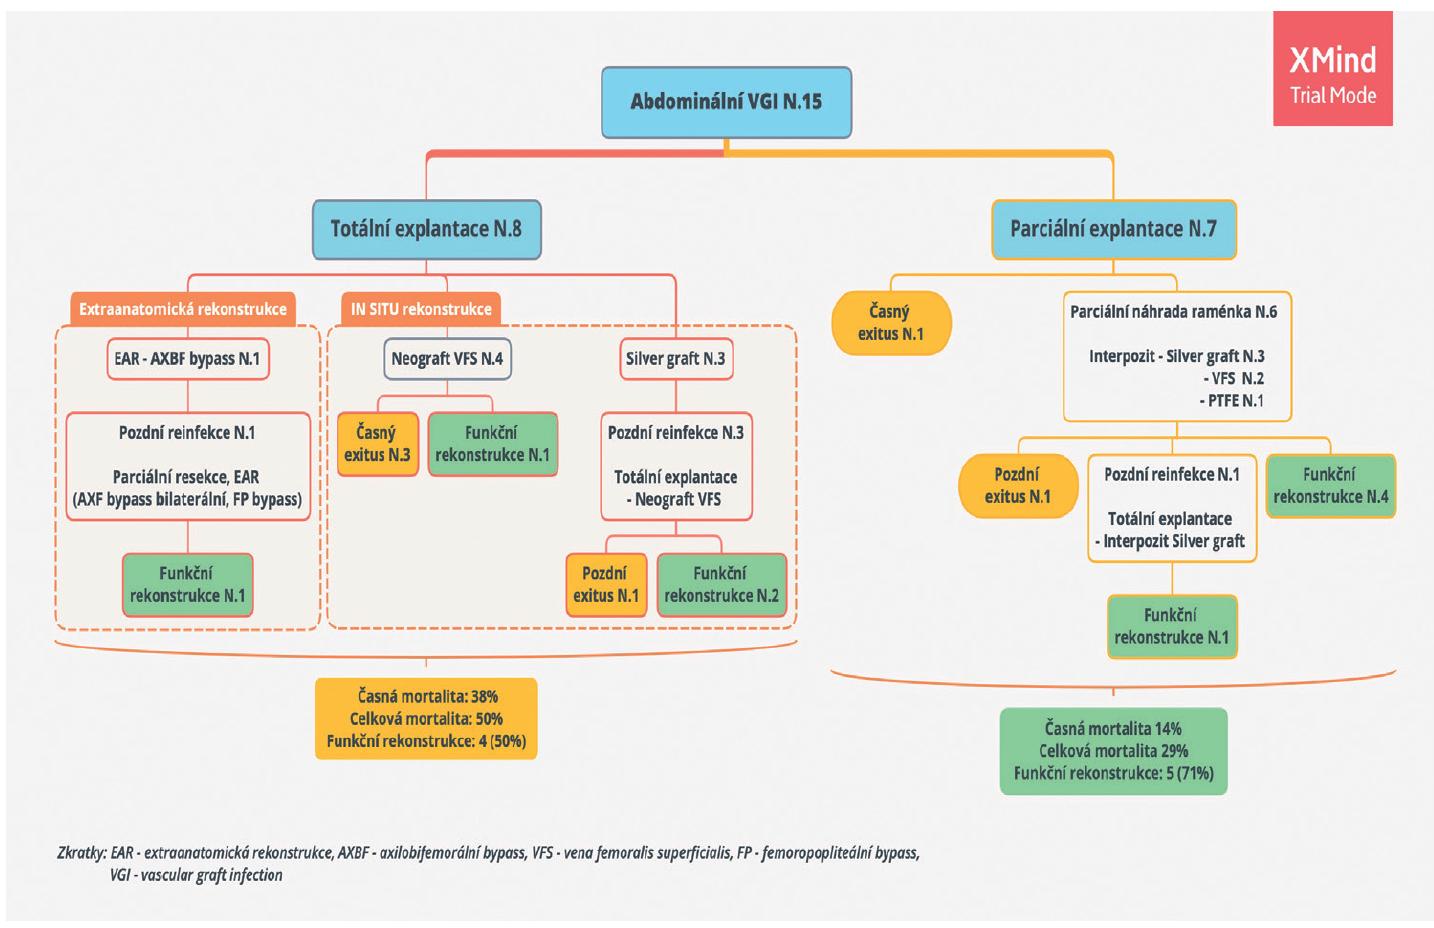 Schema 1: Diagram řešení abdominální VGI v našem souboru <br> Diagram 1: Flowchart of abdominal VGI management in our patient cohort